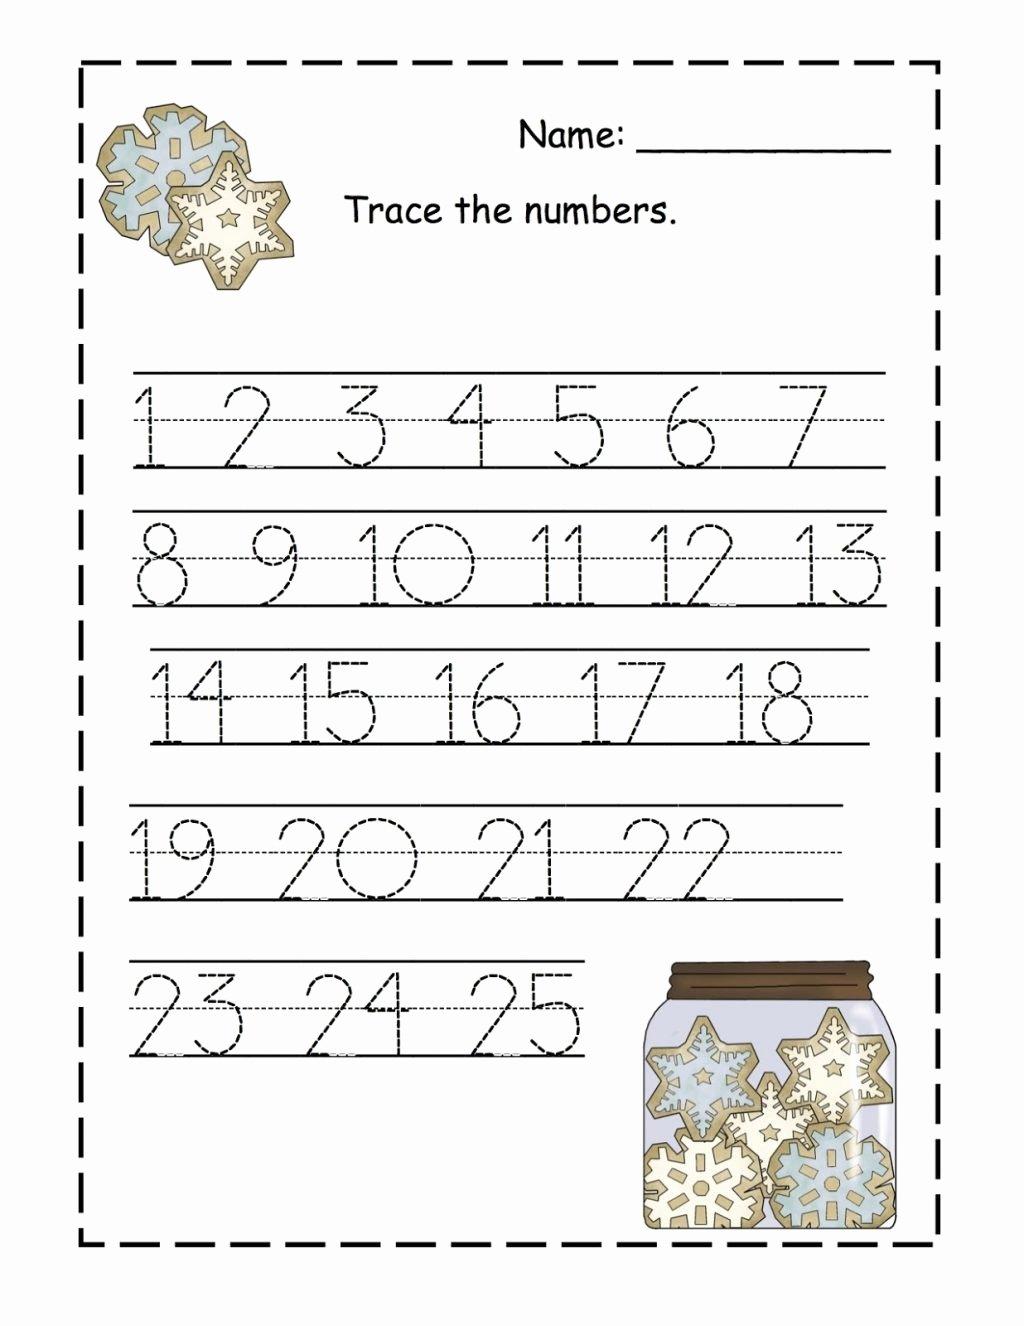 Printable Worksheets for Preschoolers to Write their Name New Worksheet Preschoolts Free Printable Number Frozen